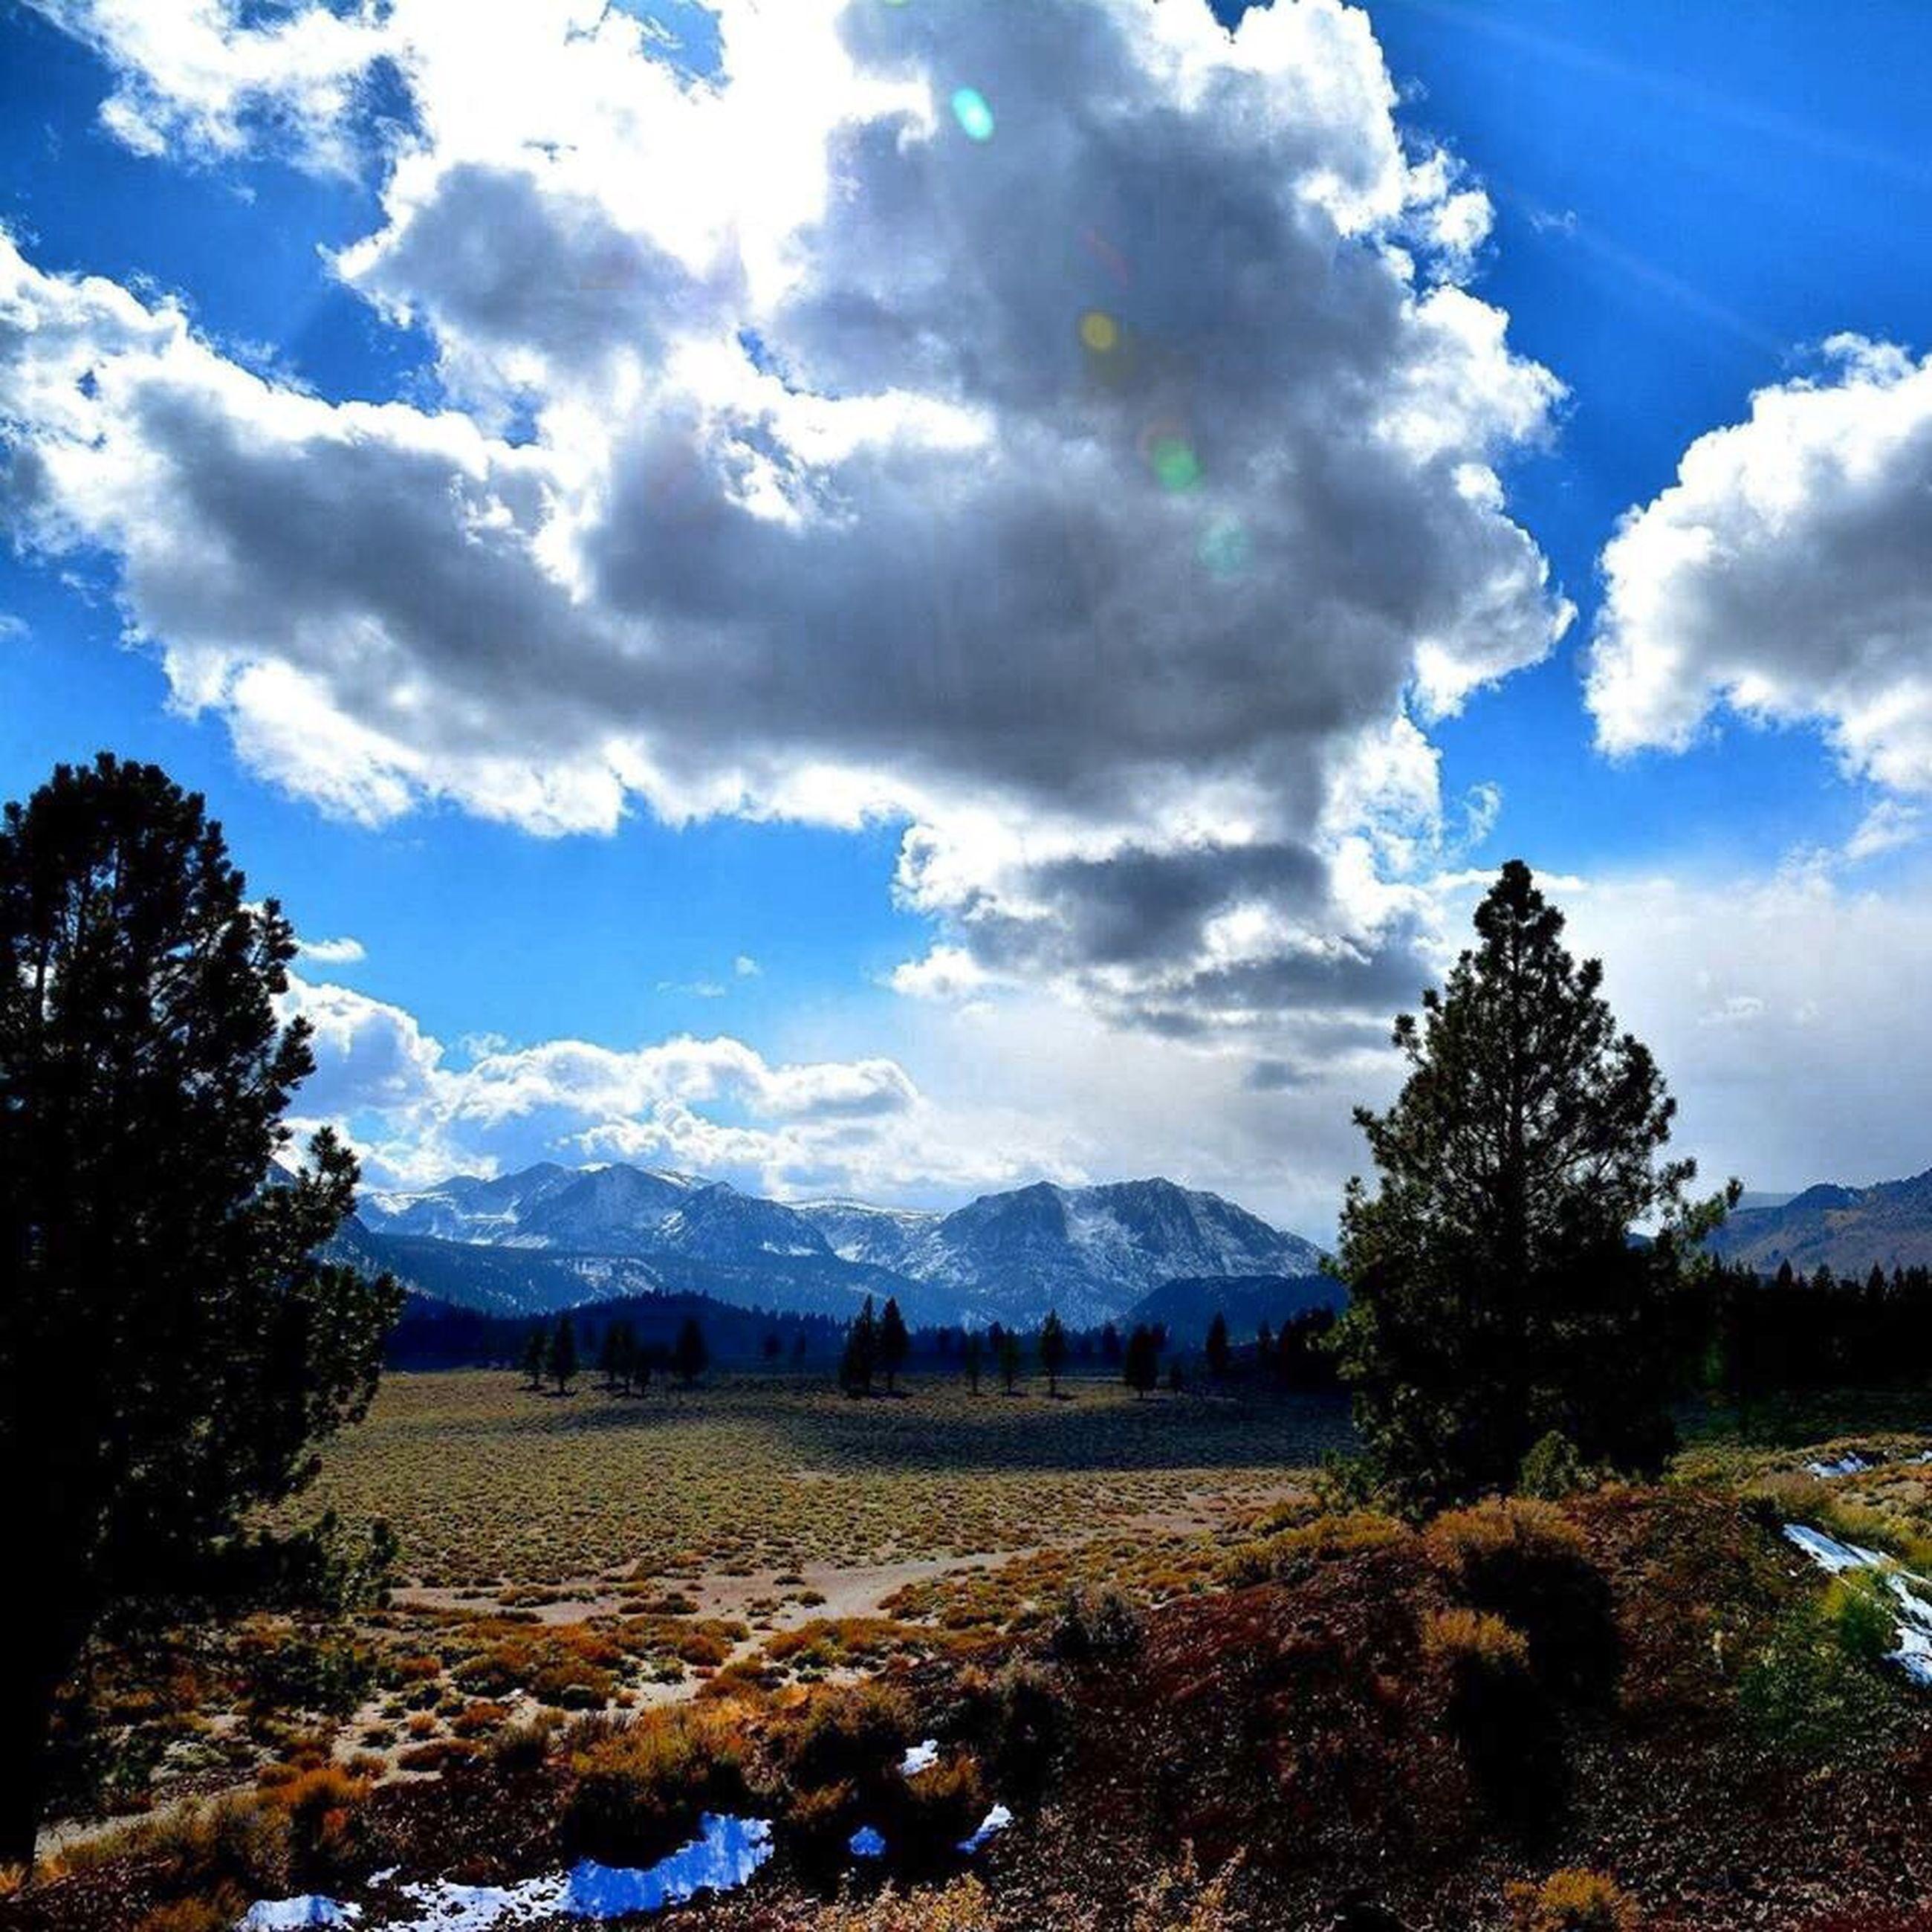 sky, tranquil scene, landscape, tranquility, cloud - sky, scenics, beauty in nature, nature, cloud, blue, mountain, tree, field, non-urban scene, sunlight, day, cloudy, remote, idyllic, non urban scene